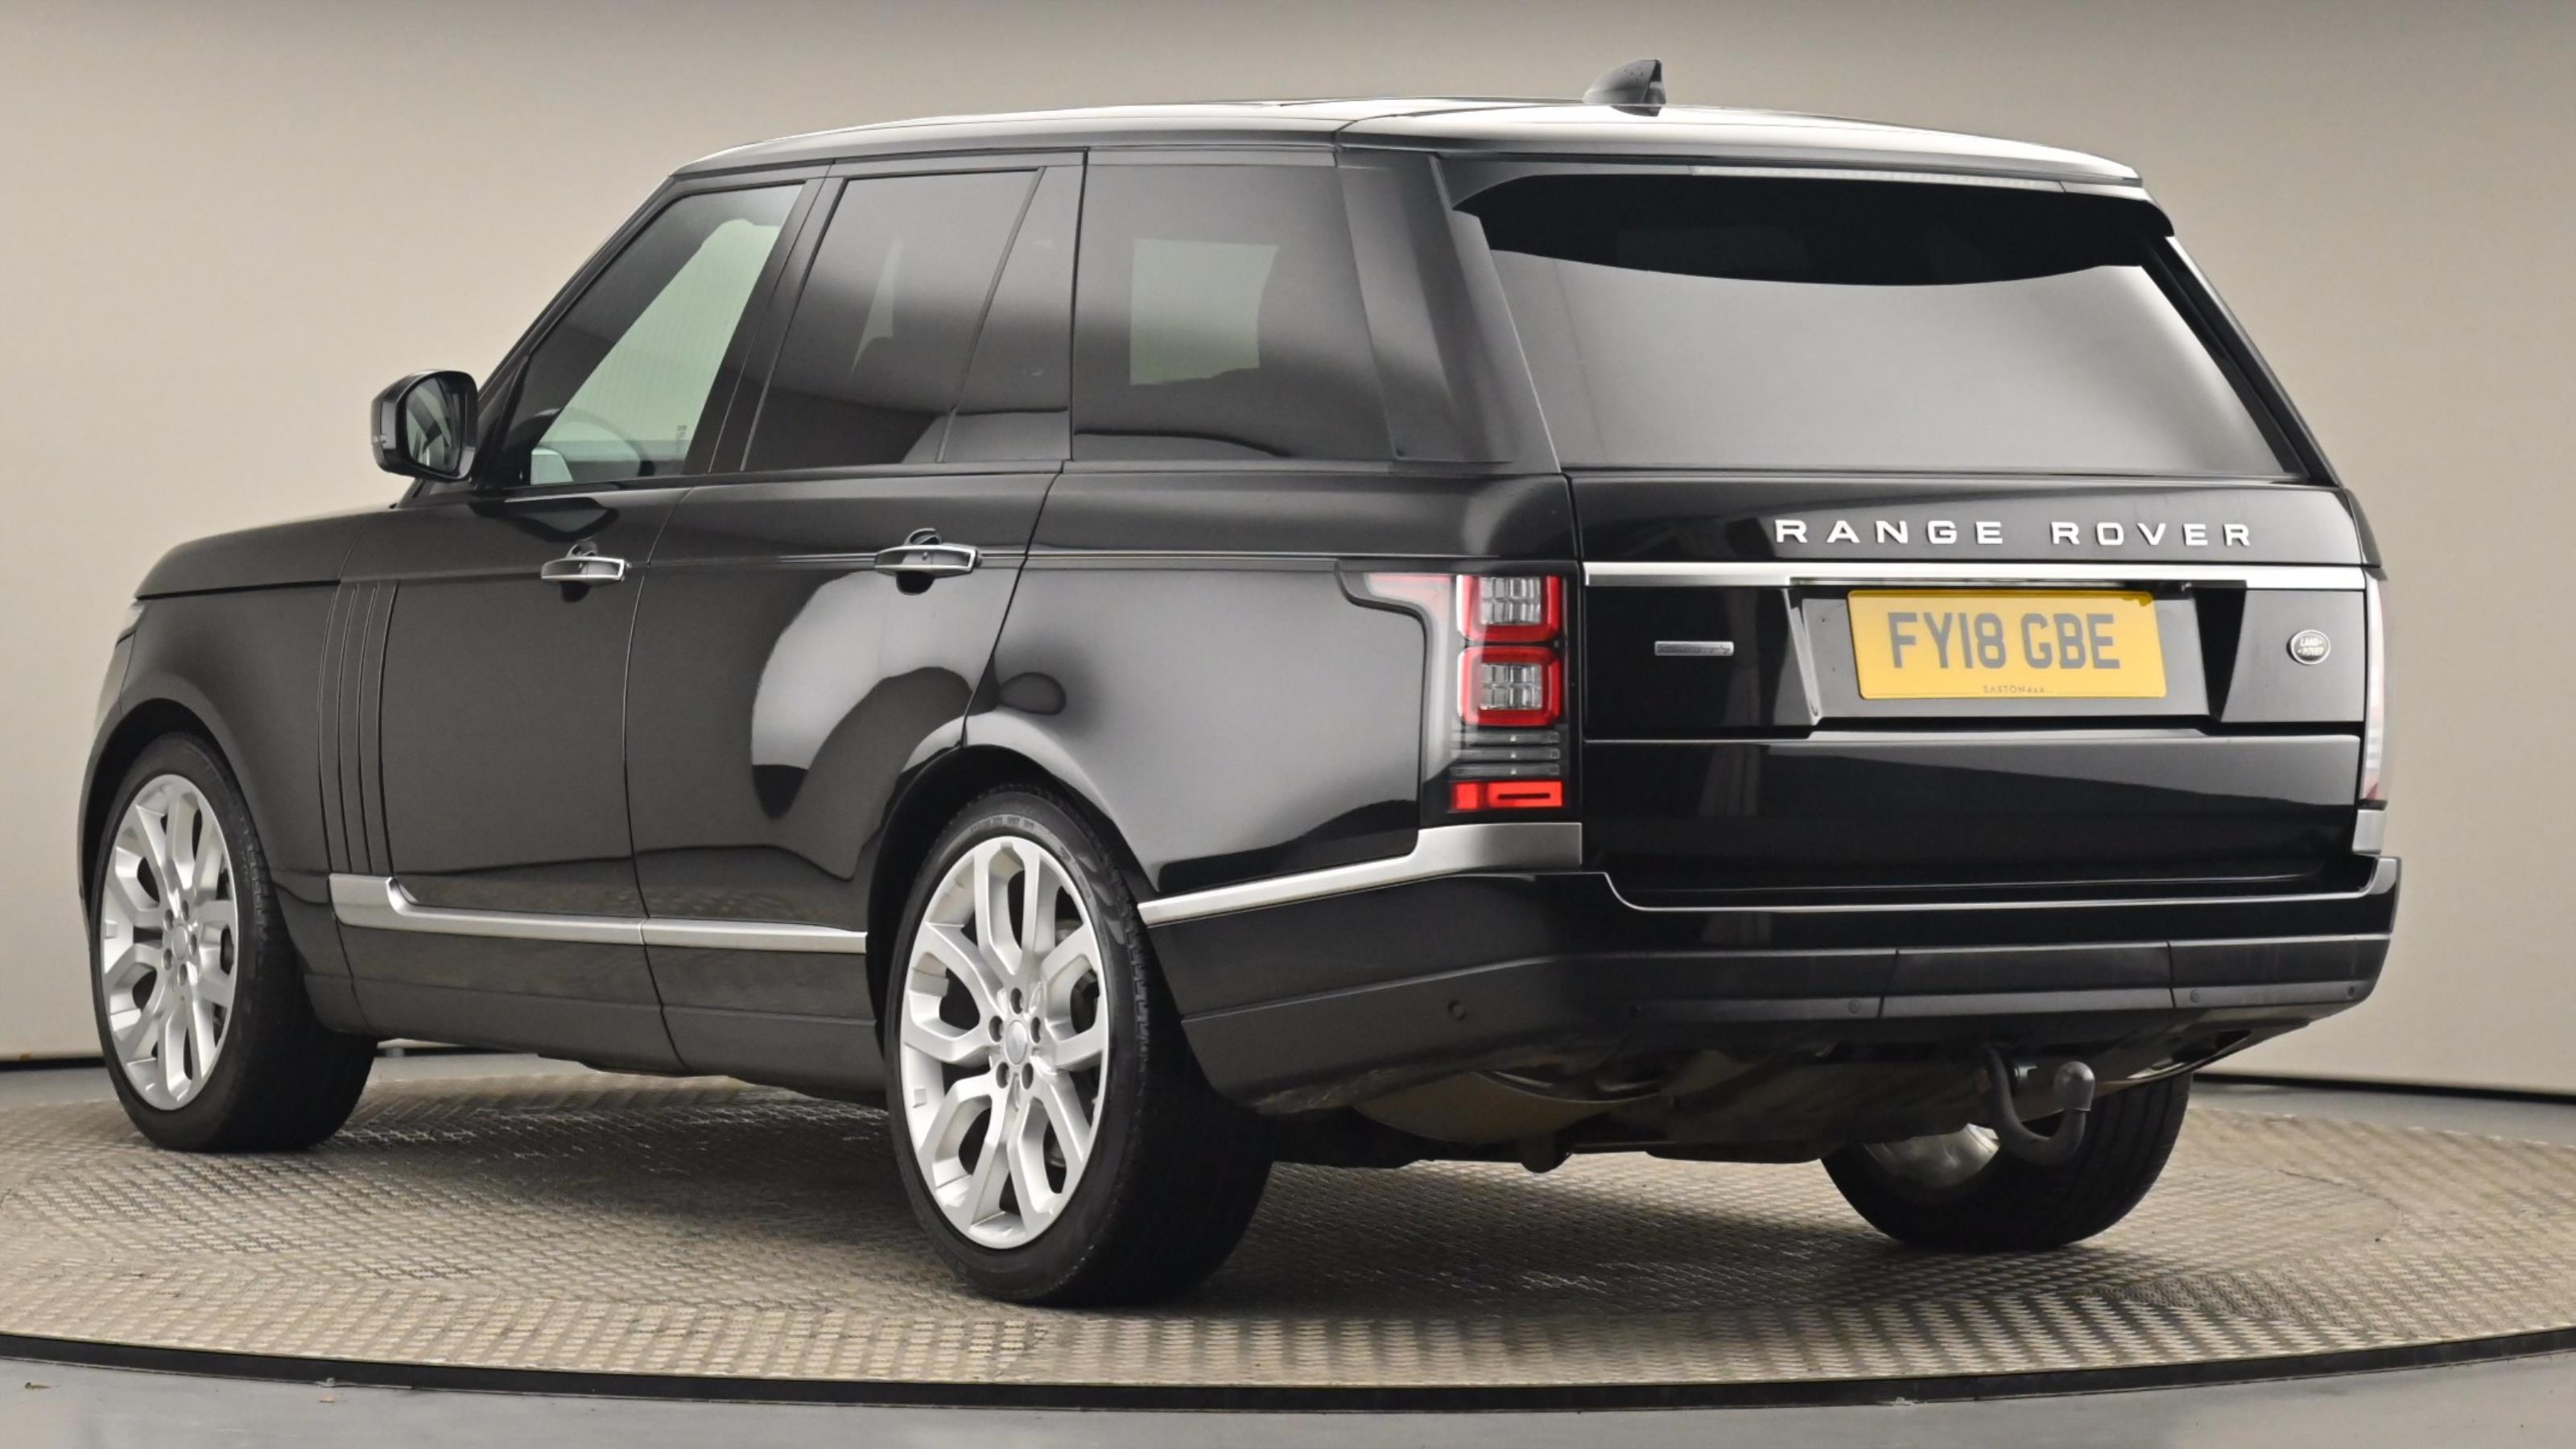 Used 2018 Land Rover RANGE ROVER 4.4 SDV8 Autobiography 4dr Auto BLACK at Saxton4x4